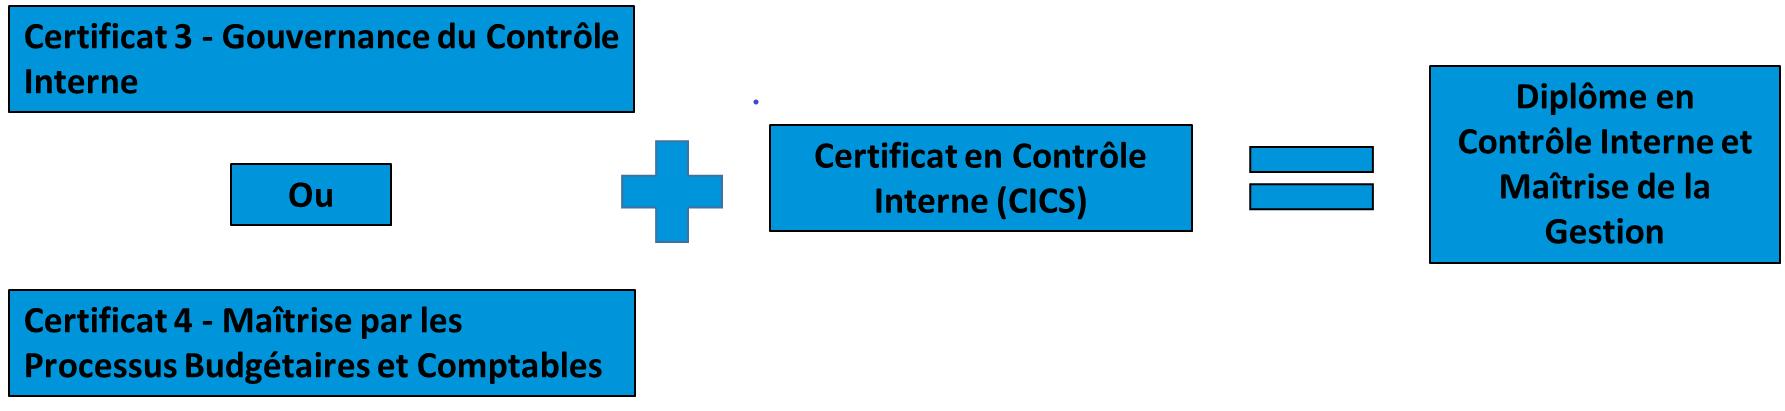 schema - Sect Public - 2 certificats